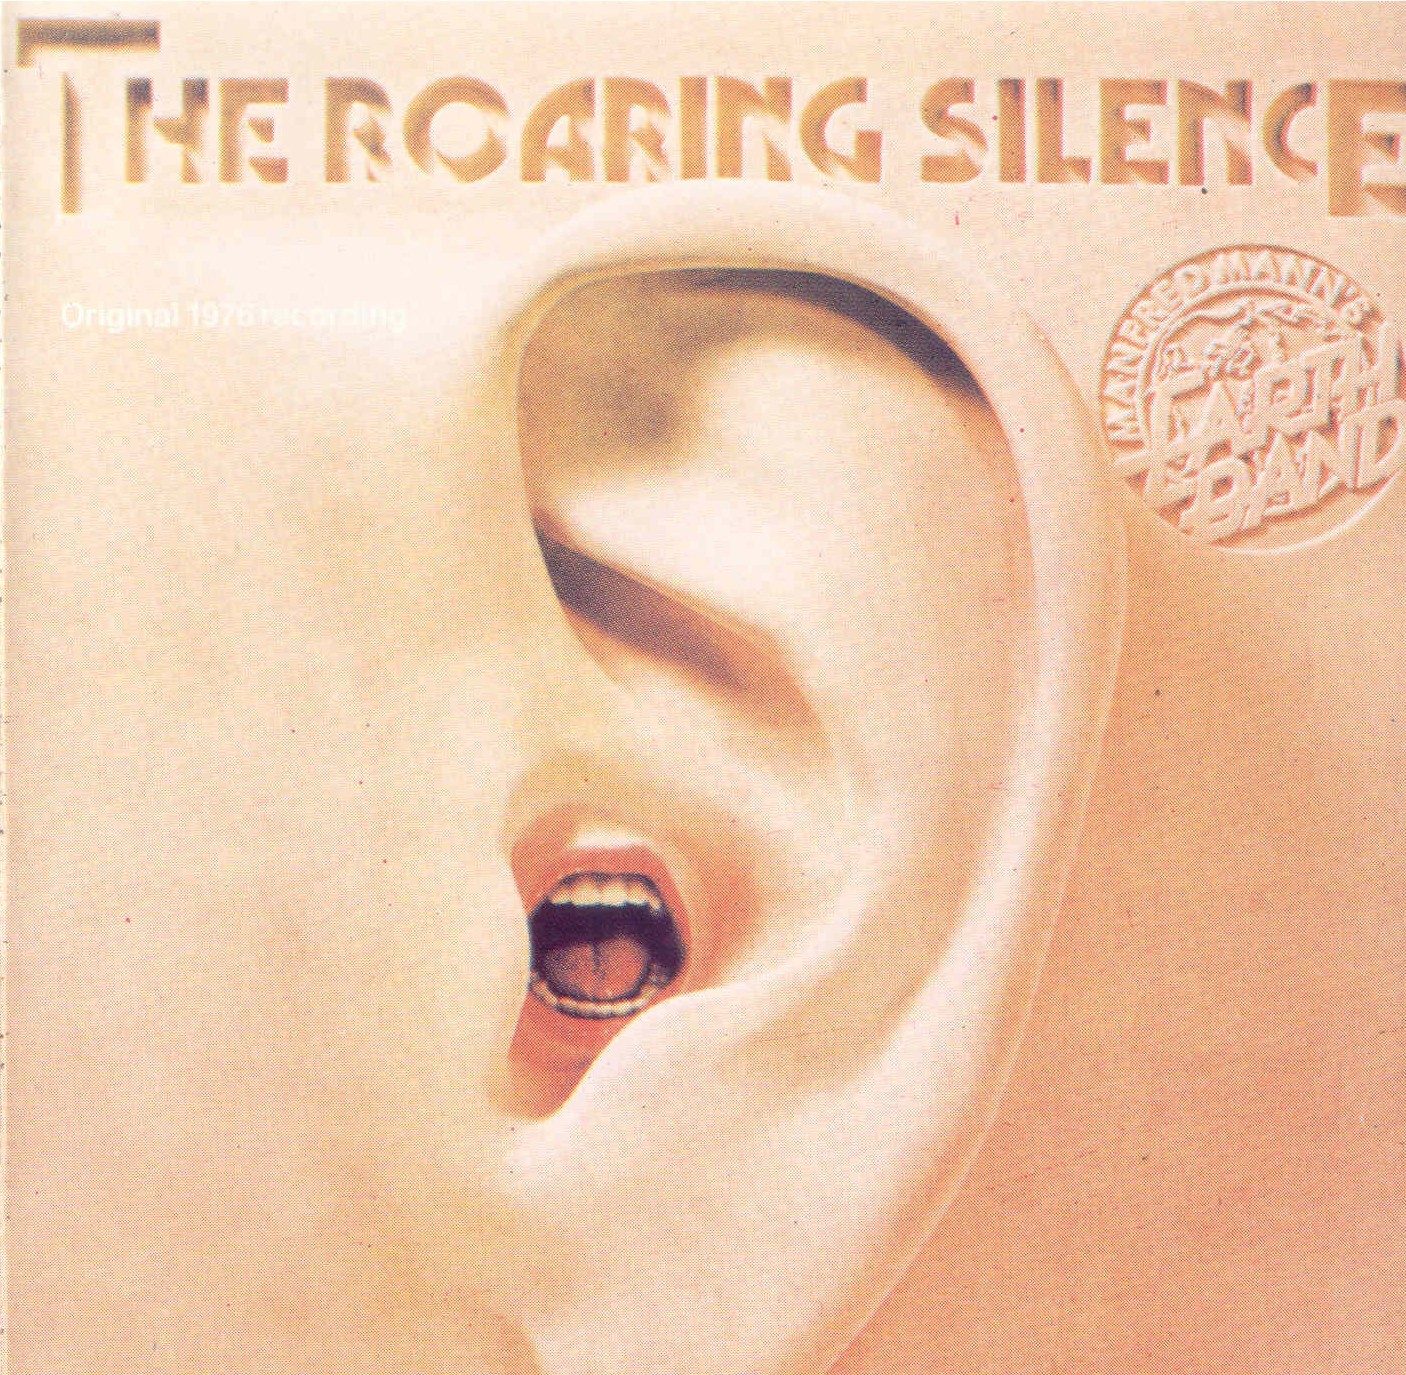 Manfred Manns Earth Band The Roaring Silence Viva